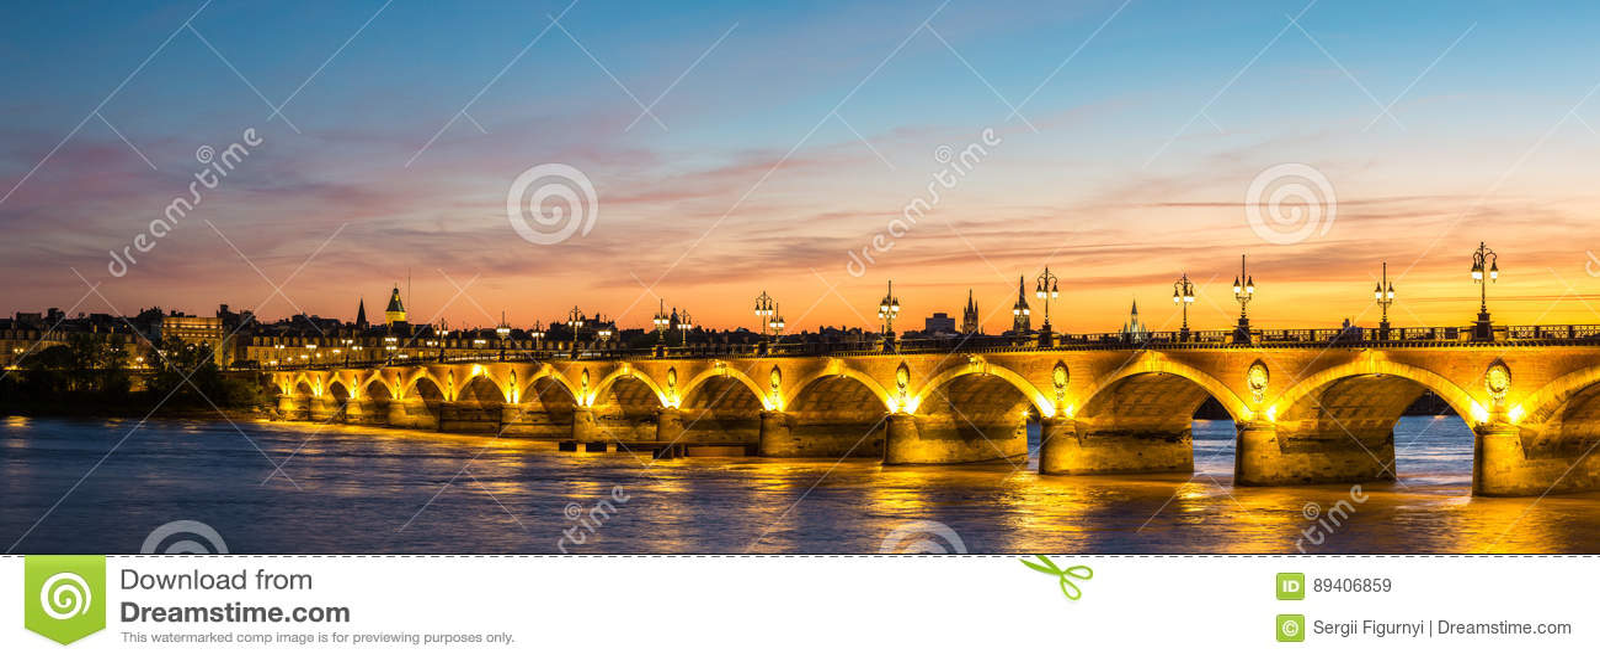 Vecchio ponte pietroso in Bordeaux